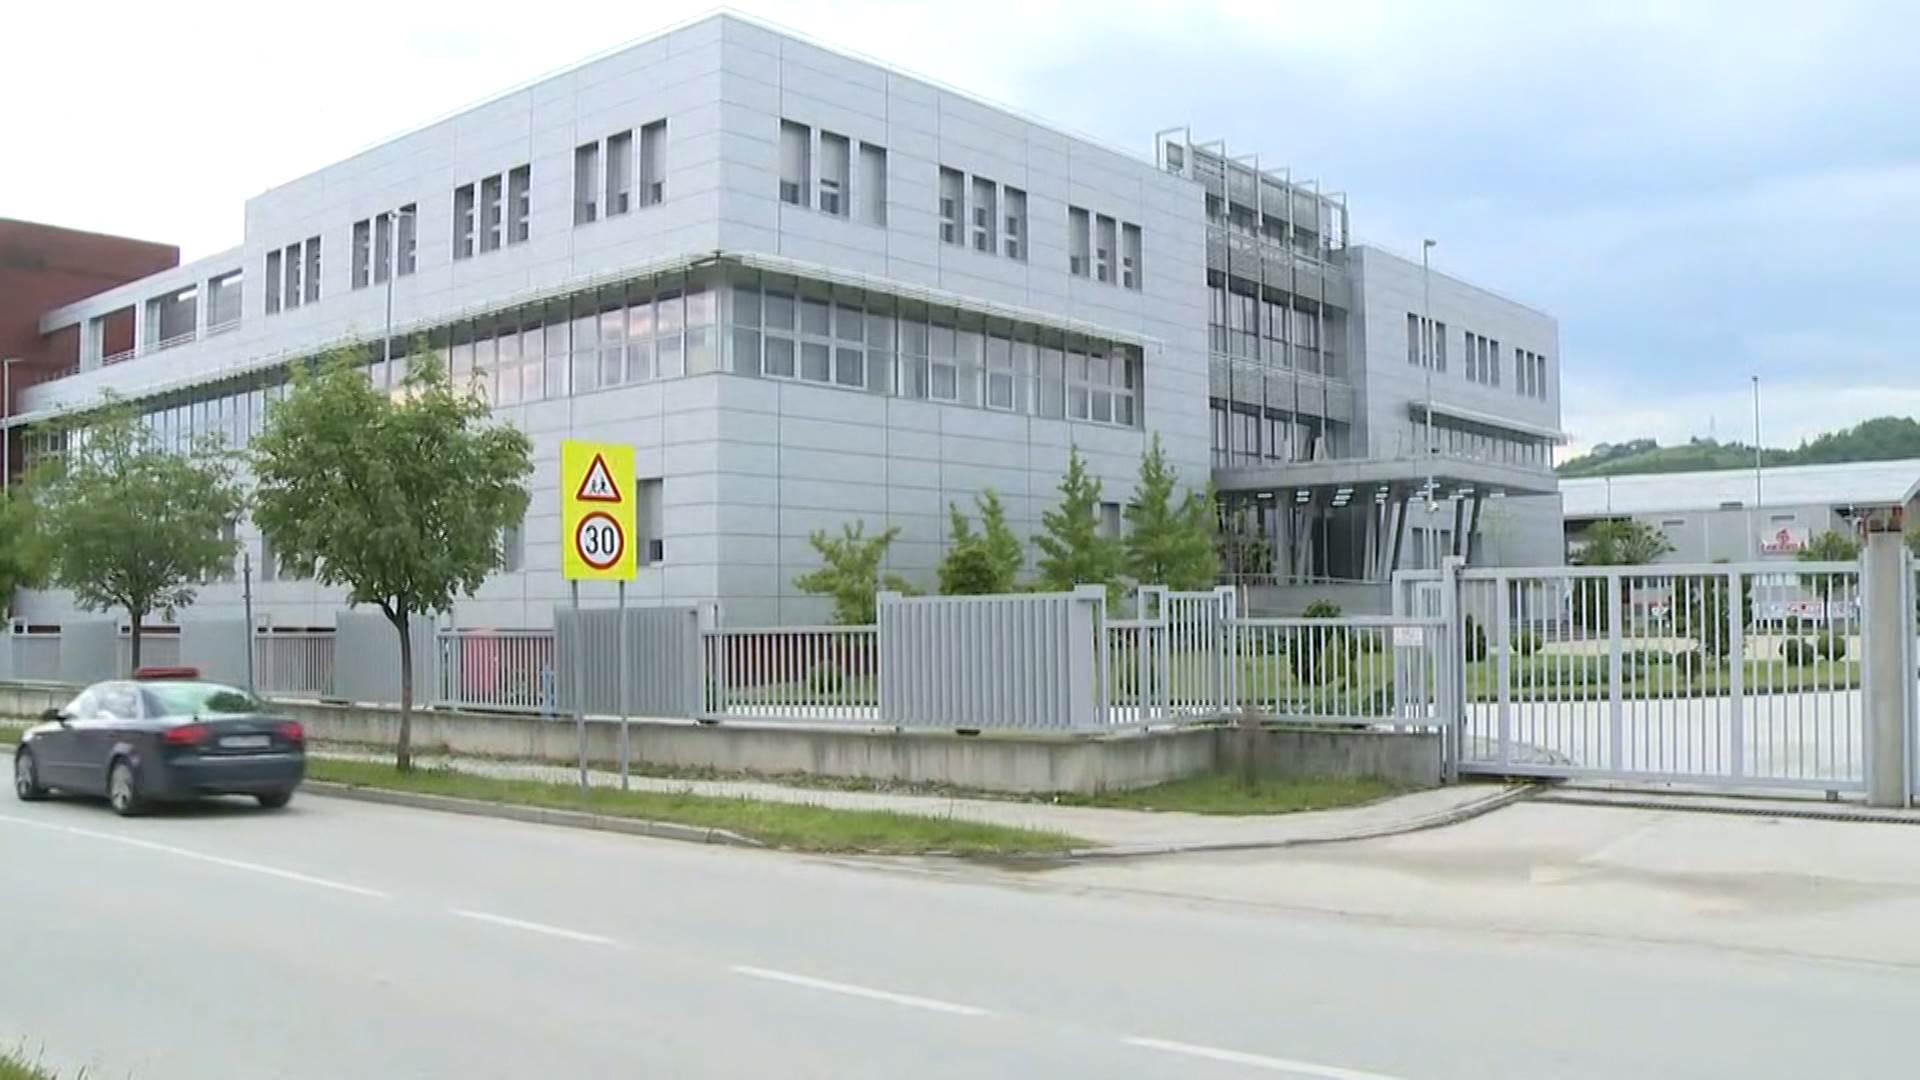 Police question PM of Bosnia's FBiH region about ventilator procurement deal